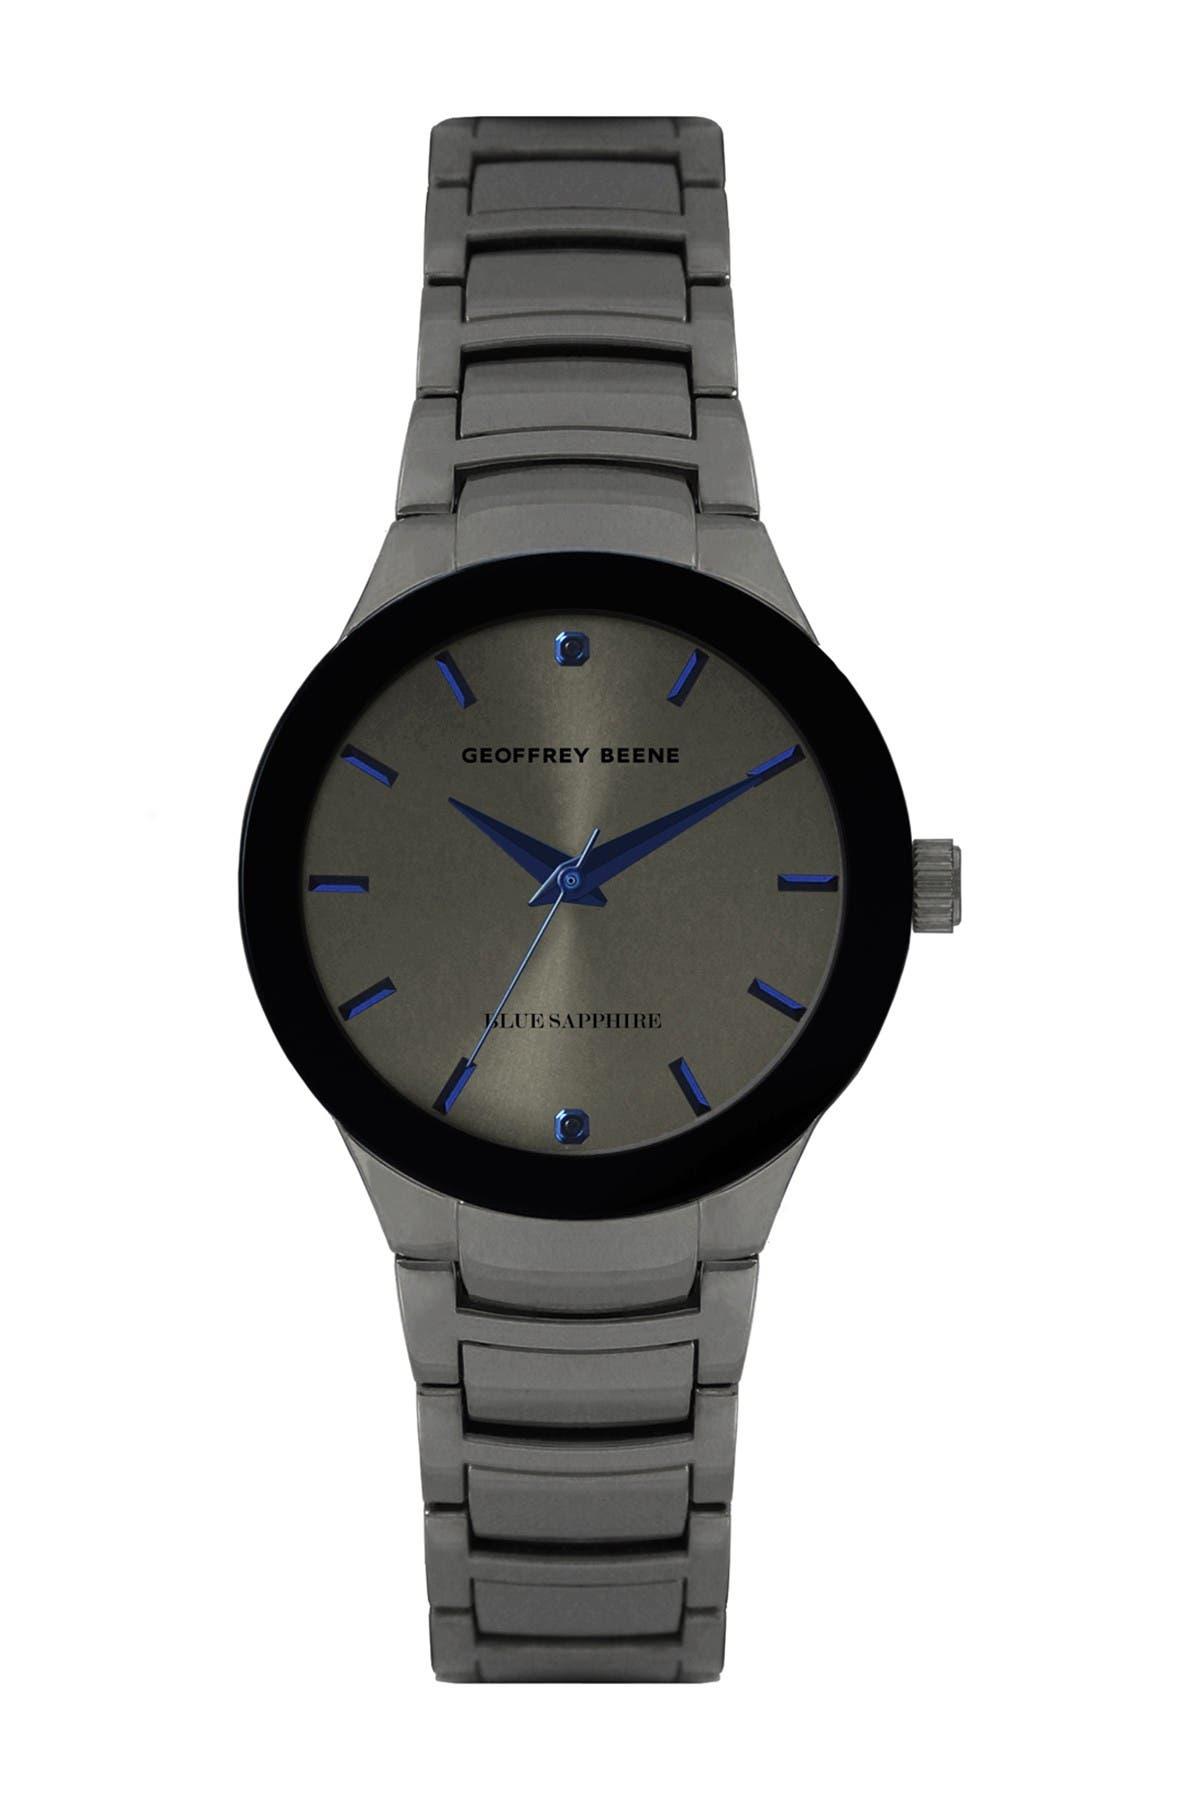 Image of Geoffrey Beene Men's Gunmetal Sapphire Bracelet Watch, 41mm